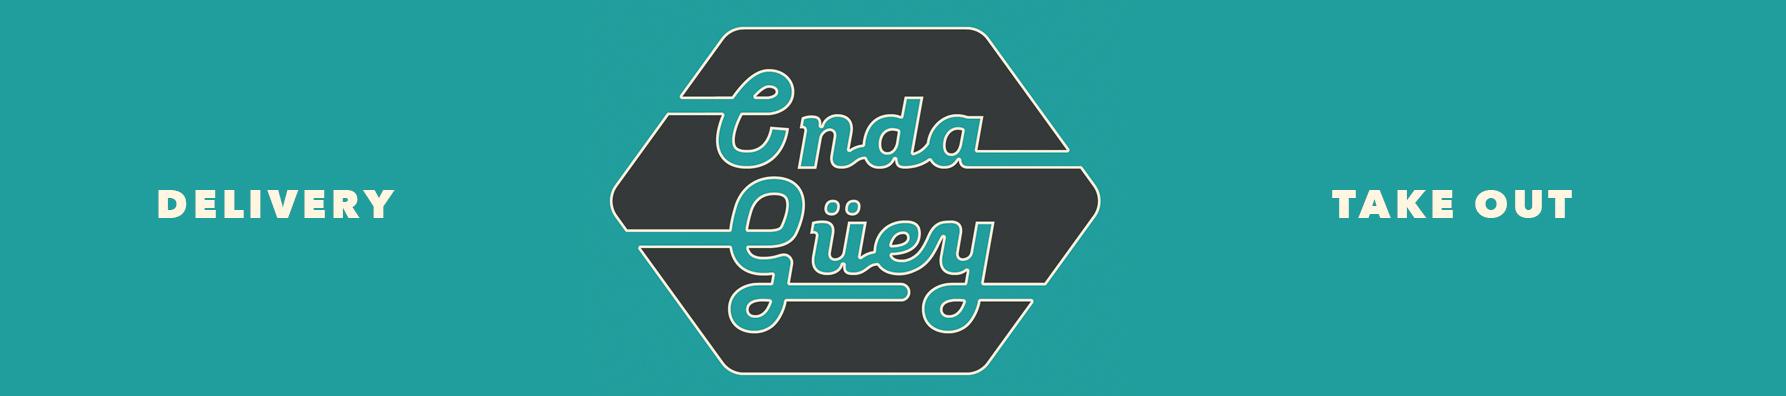 Onda_Guey_Logo_BANNER.jpg